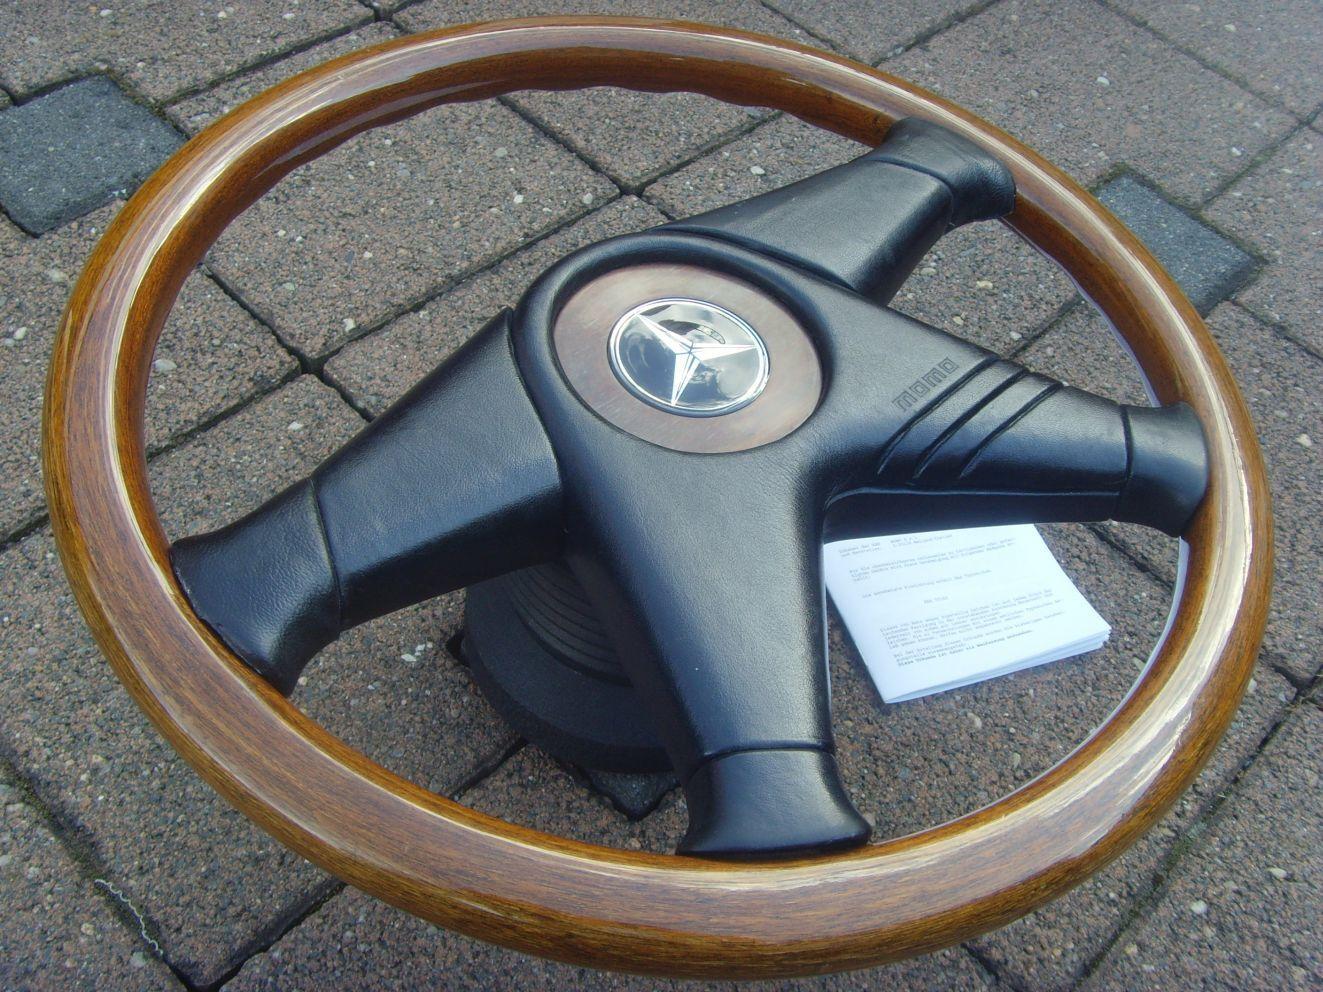 wheeltec4u